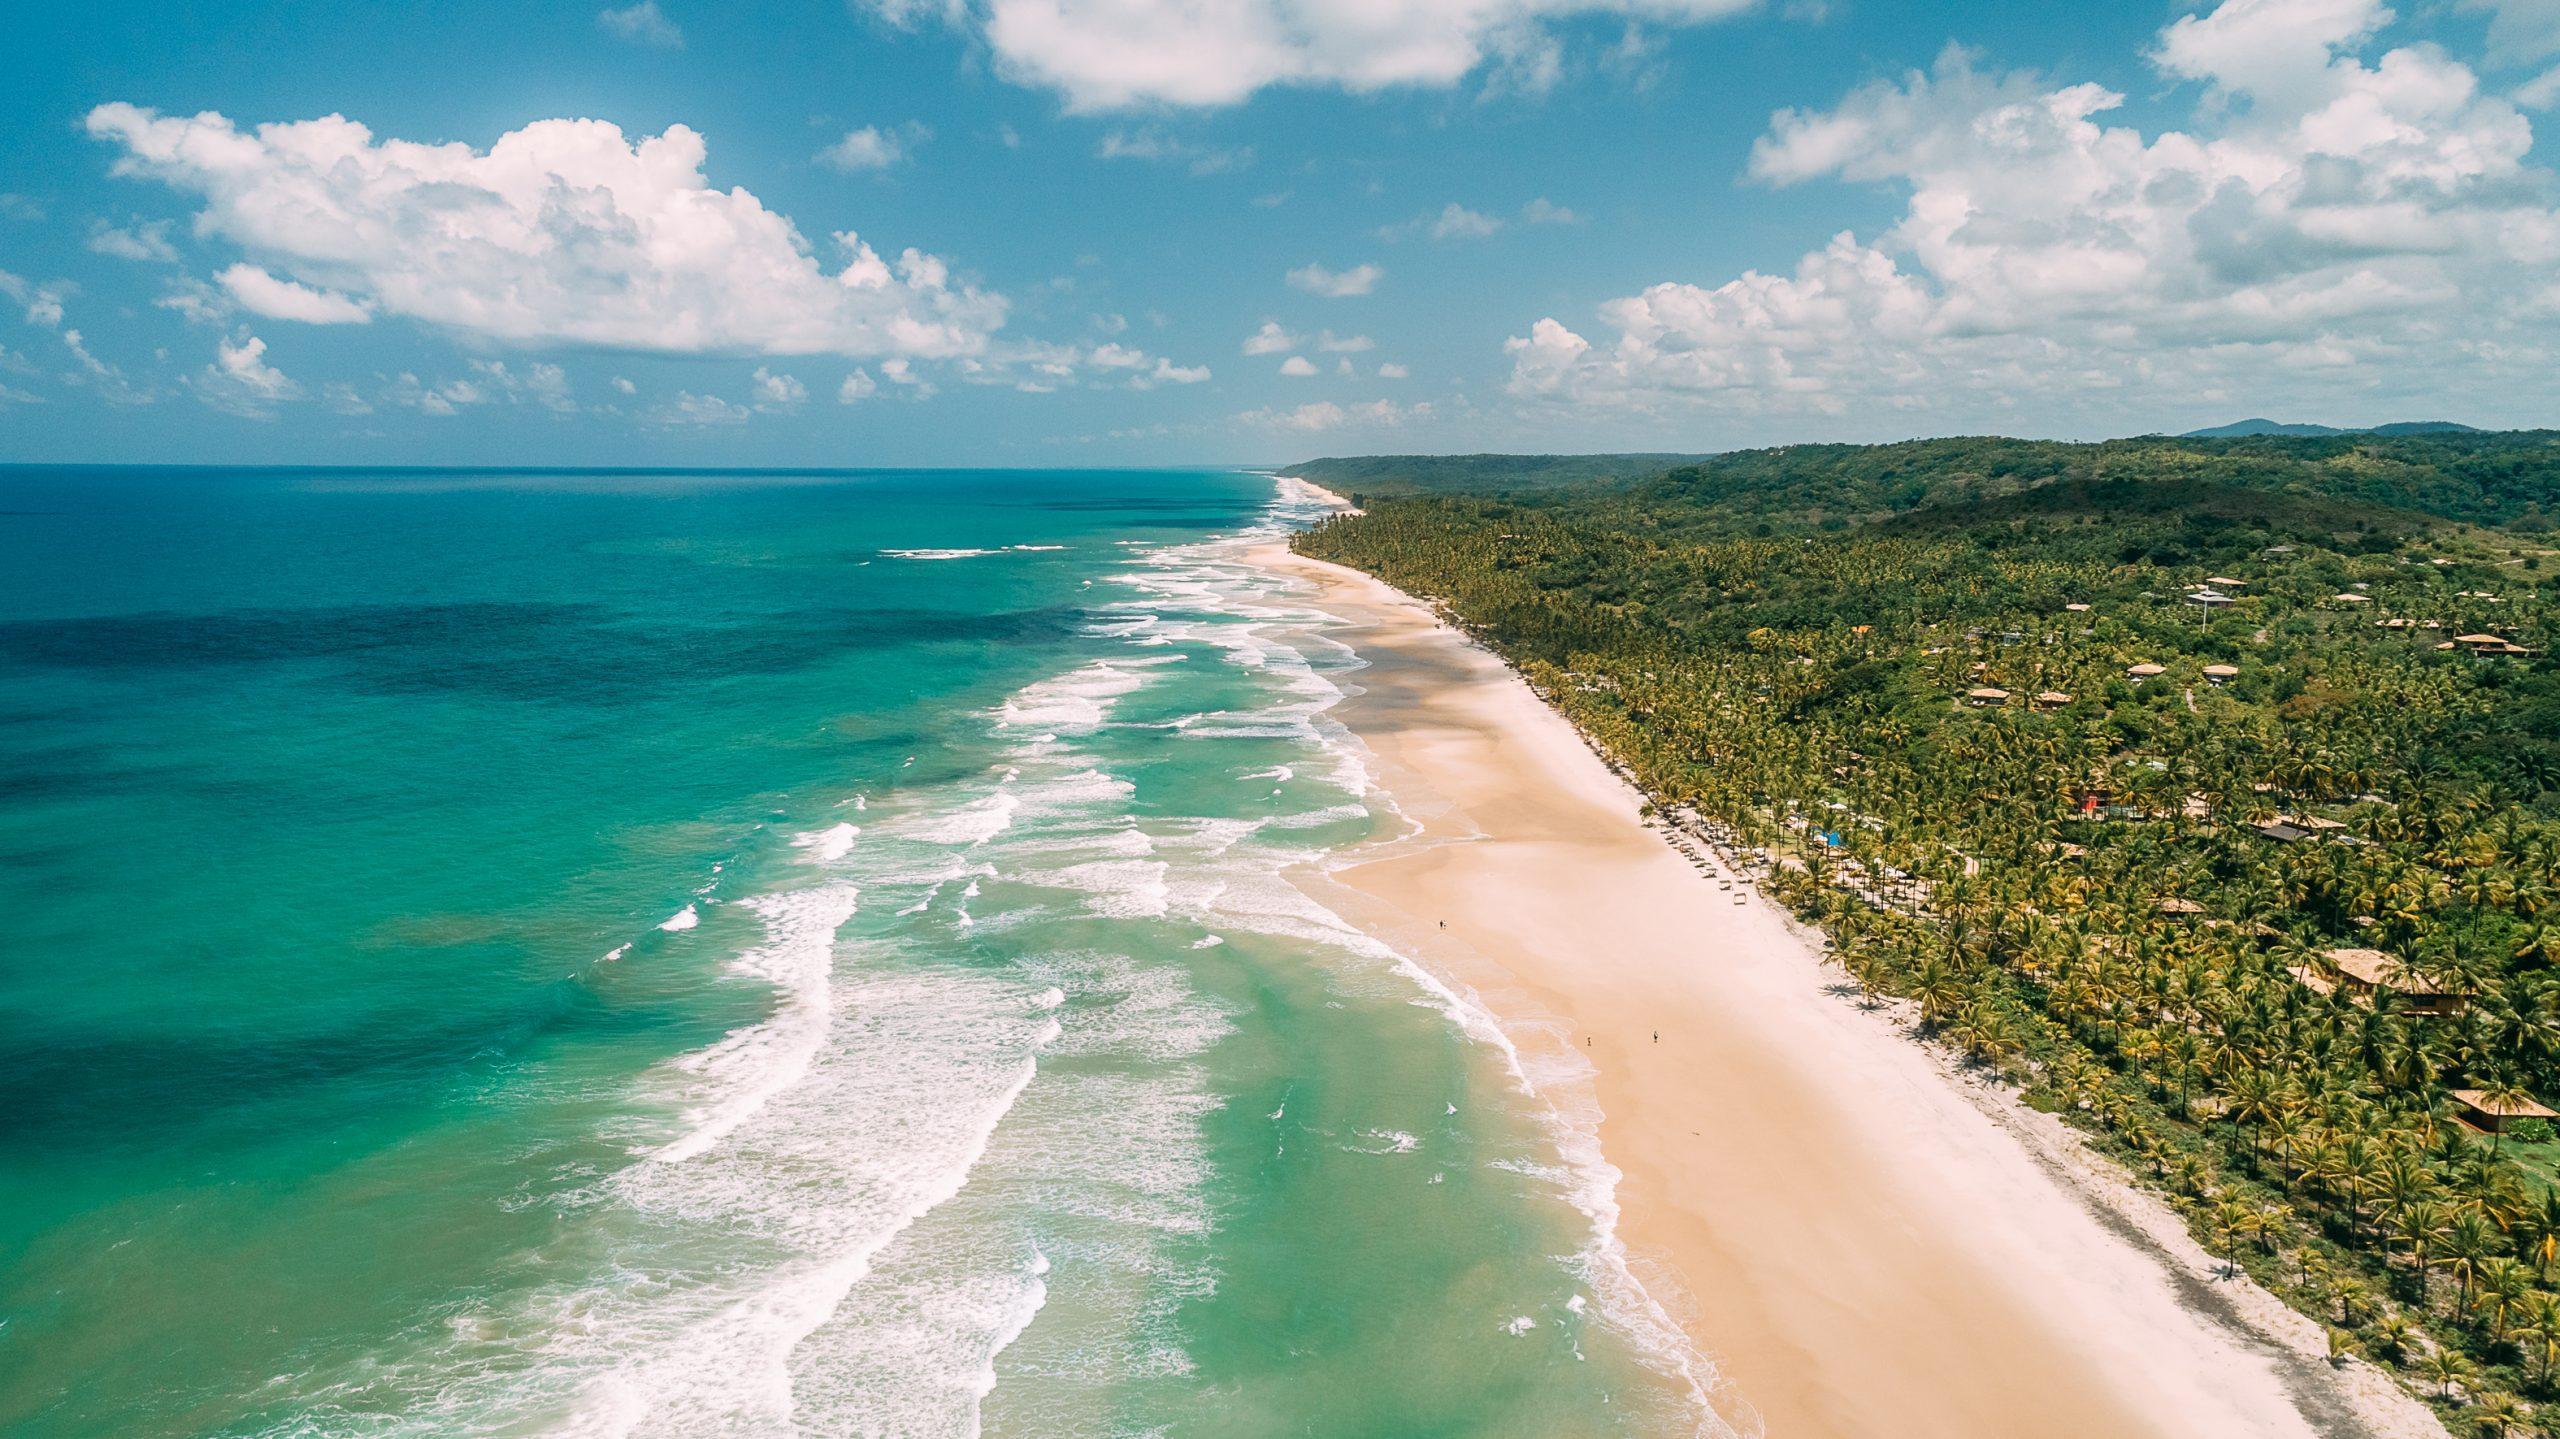 Conheça as praias mais incríveis de Trancoso e Itacaré